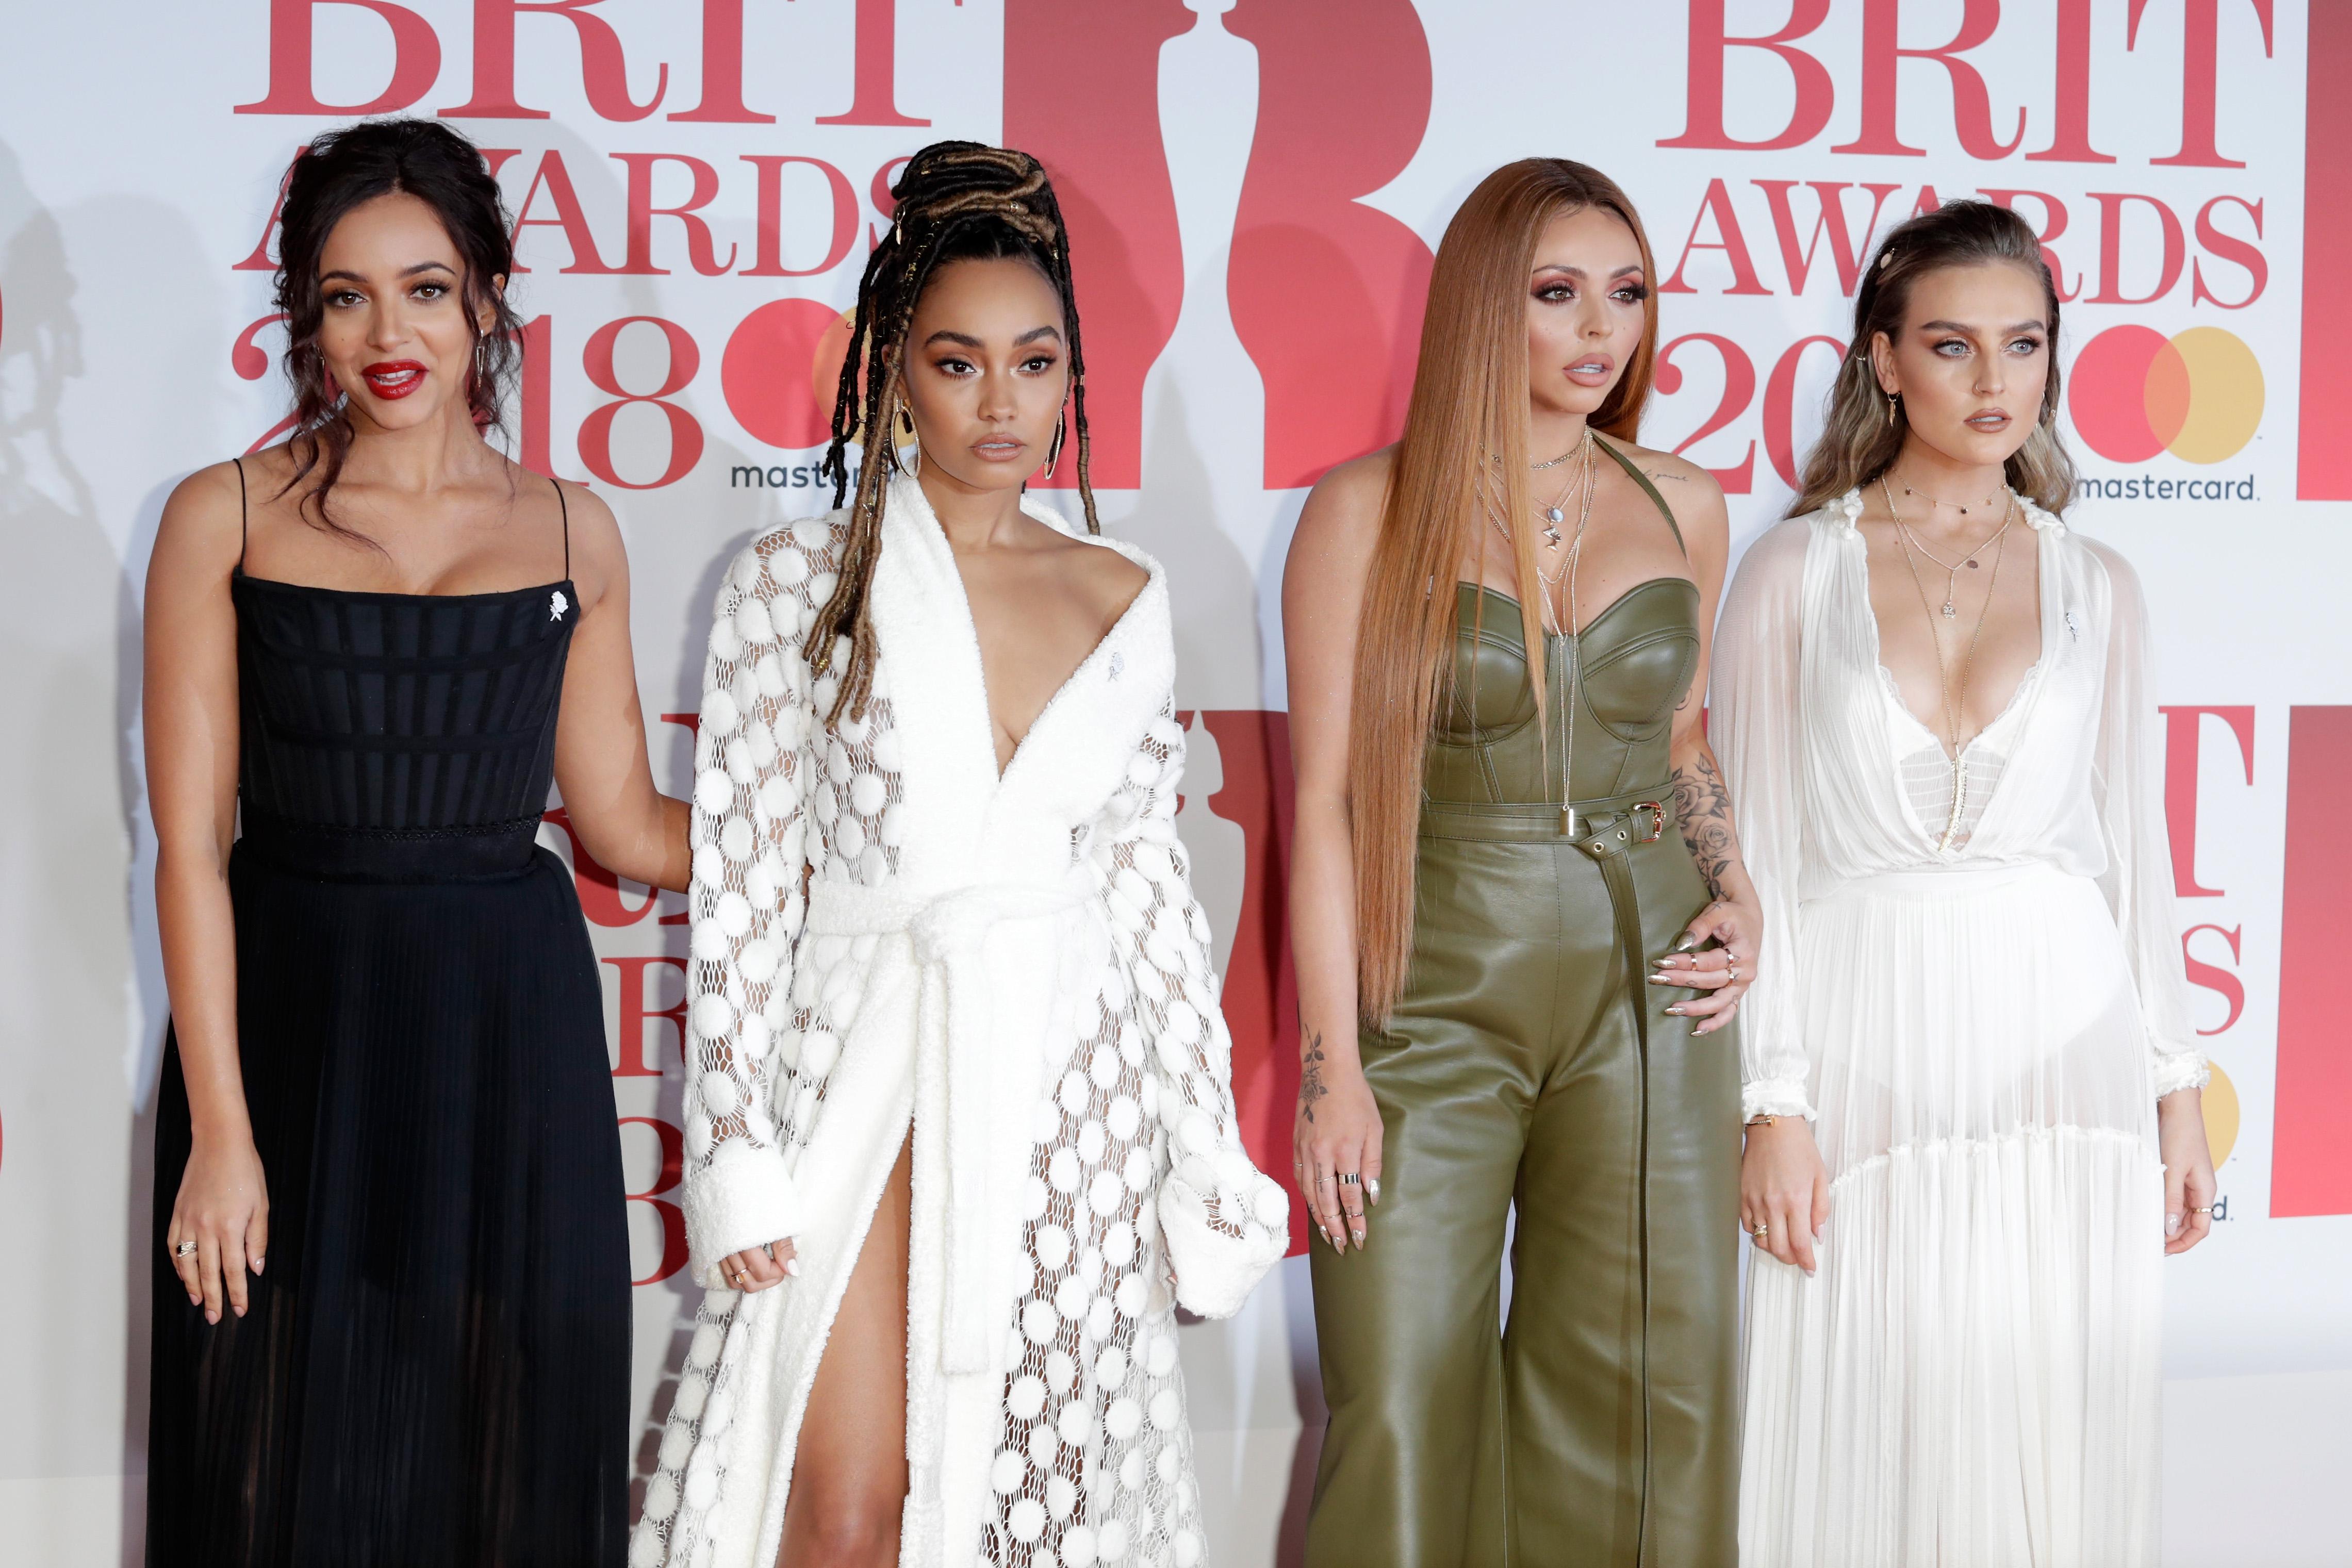 little-mix-brit-awards-2018